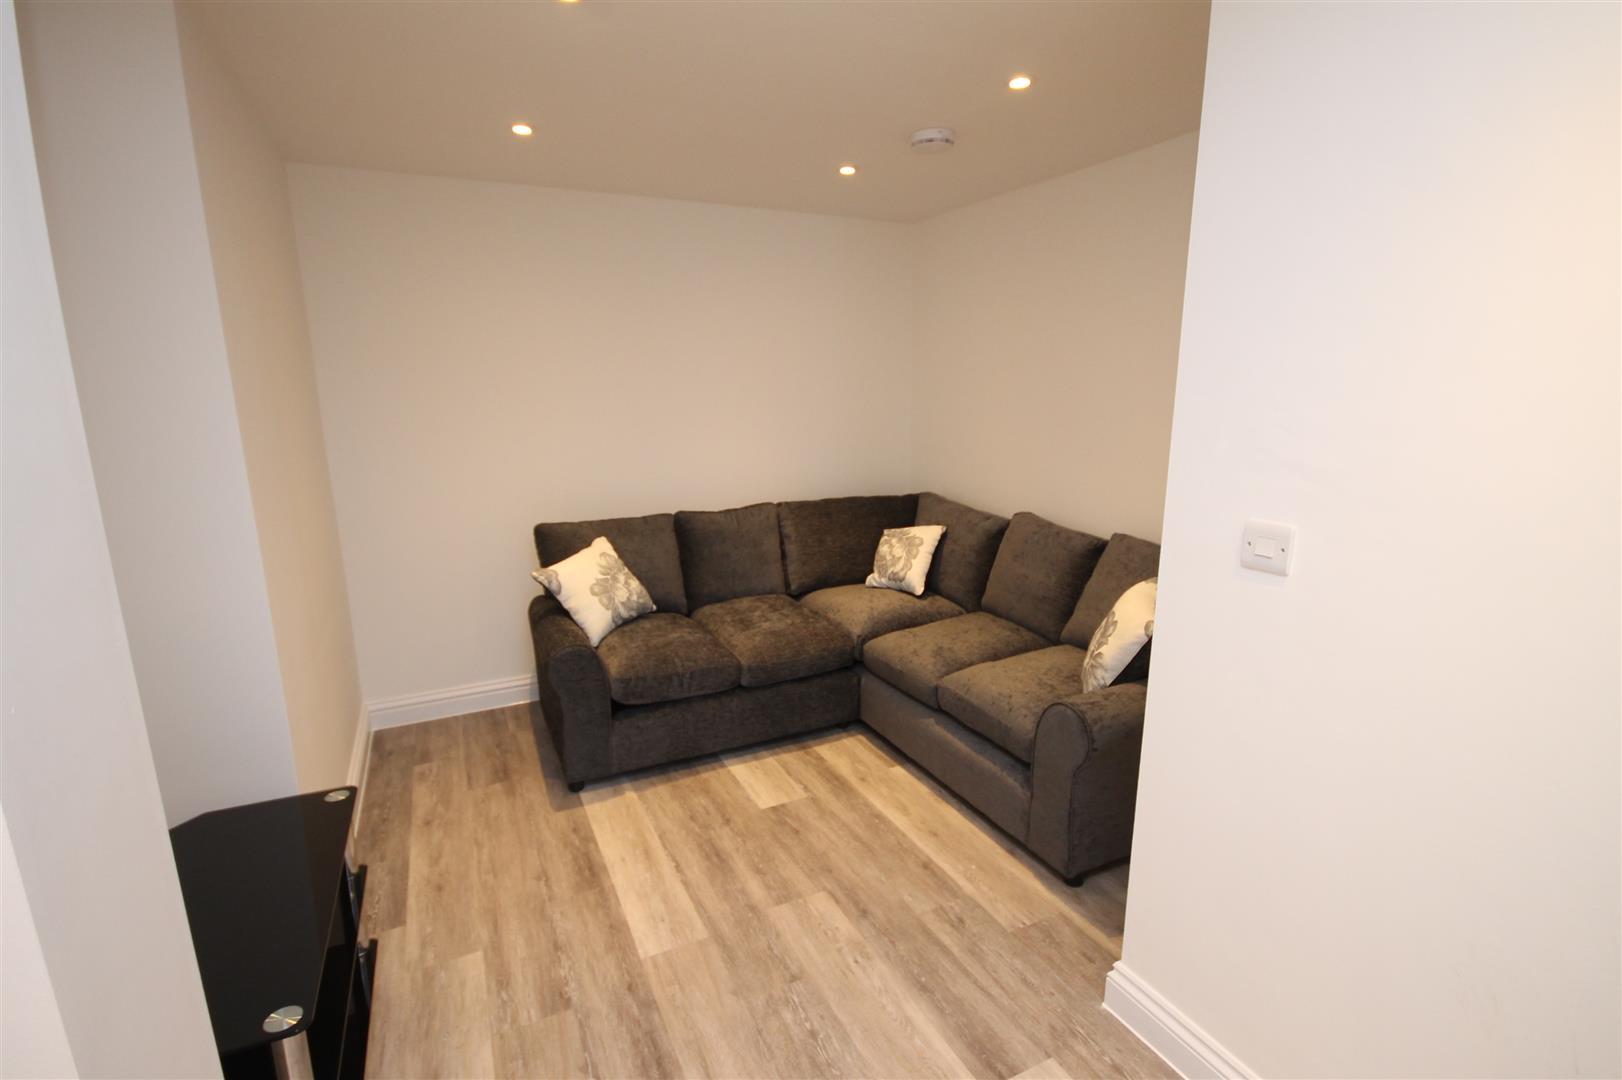 1 bed house share to rent in Richmond Villas, Bristol, BS11